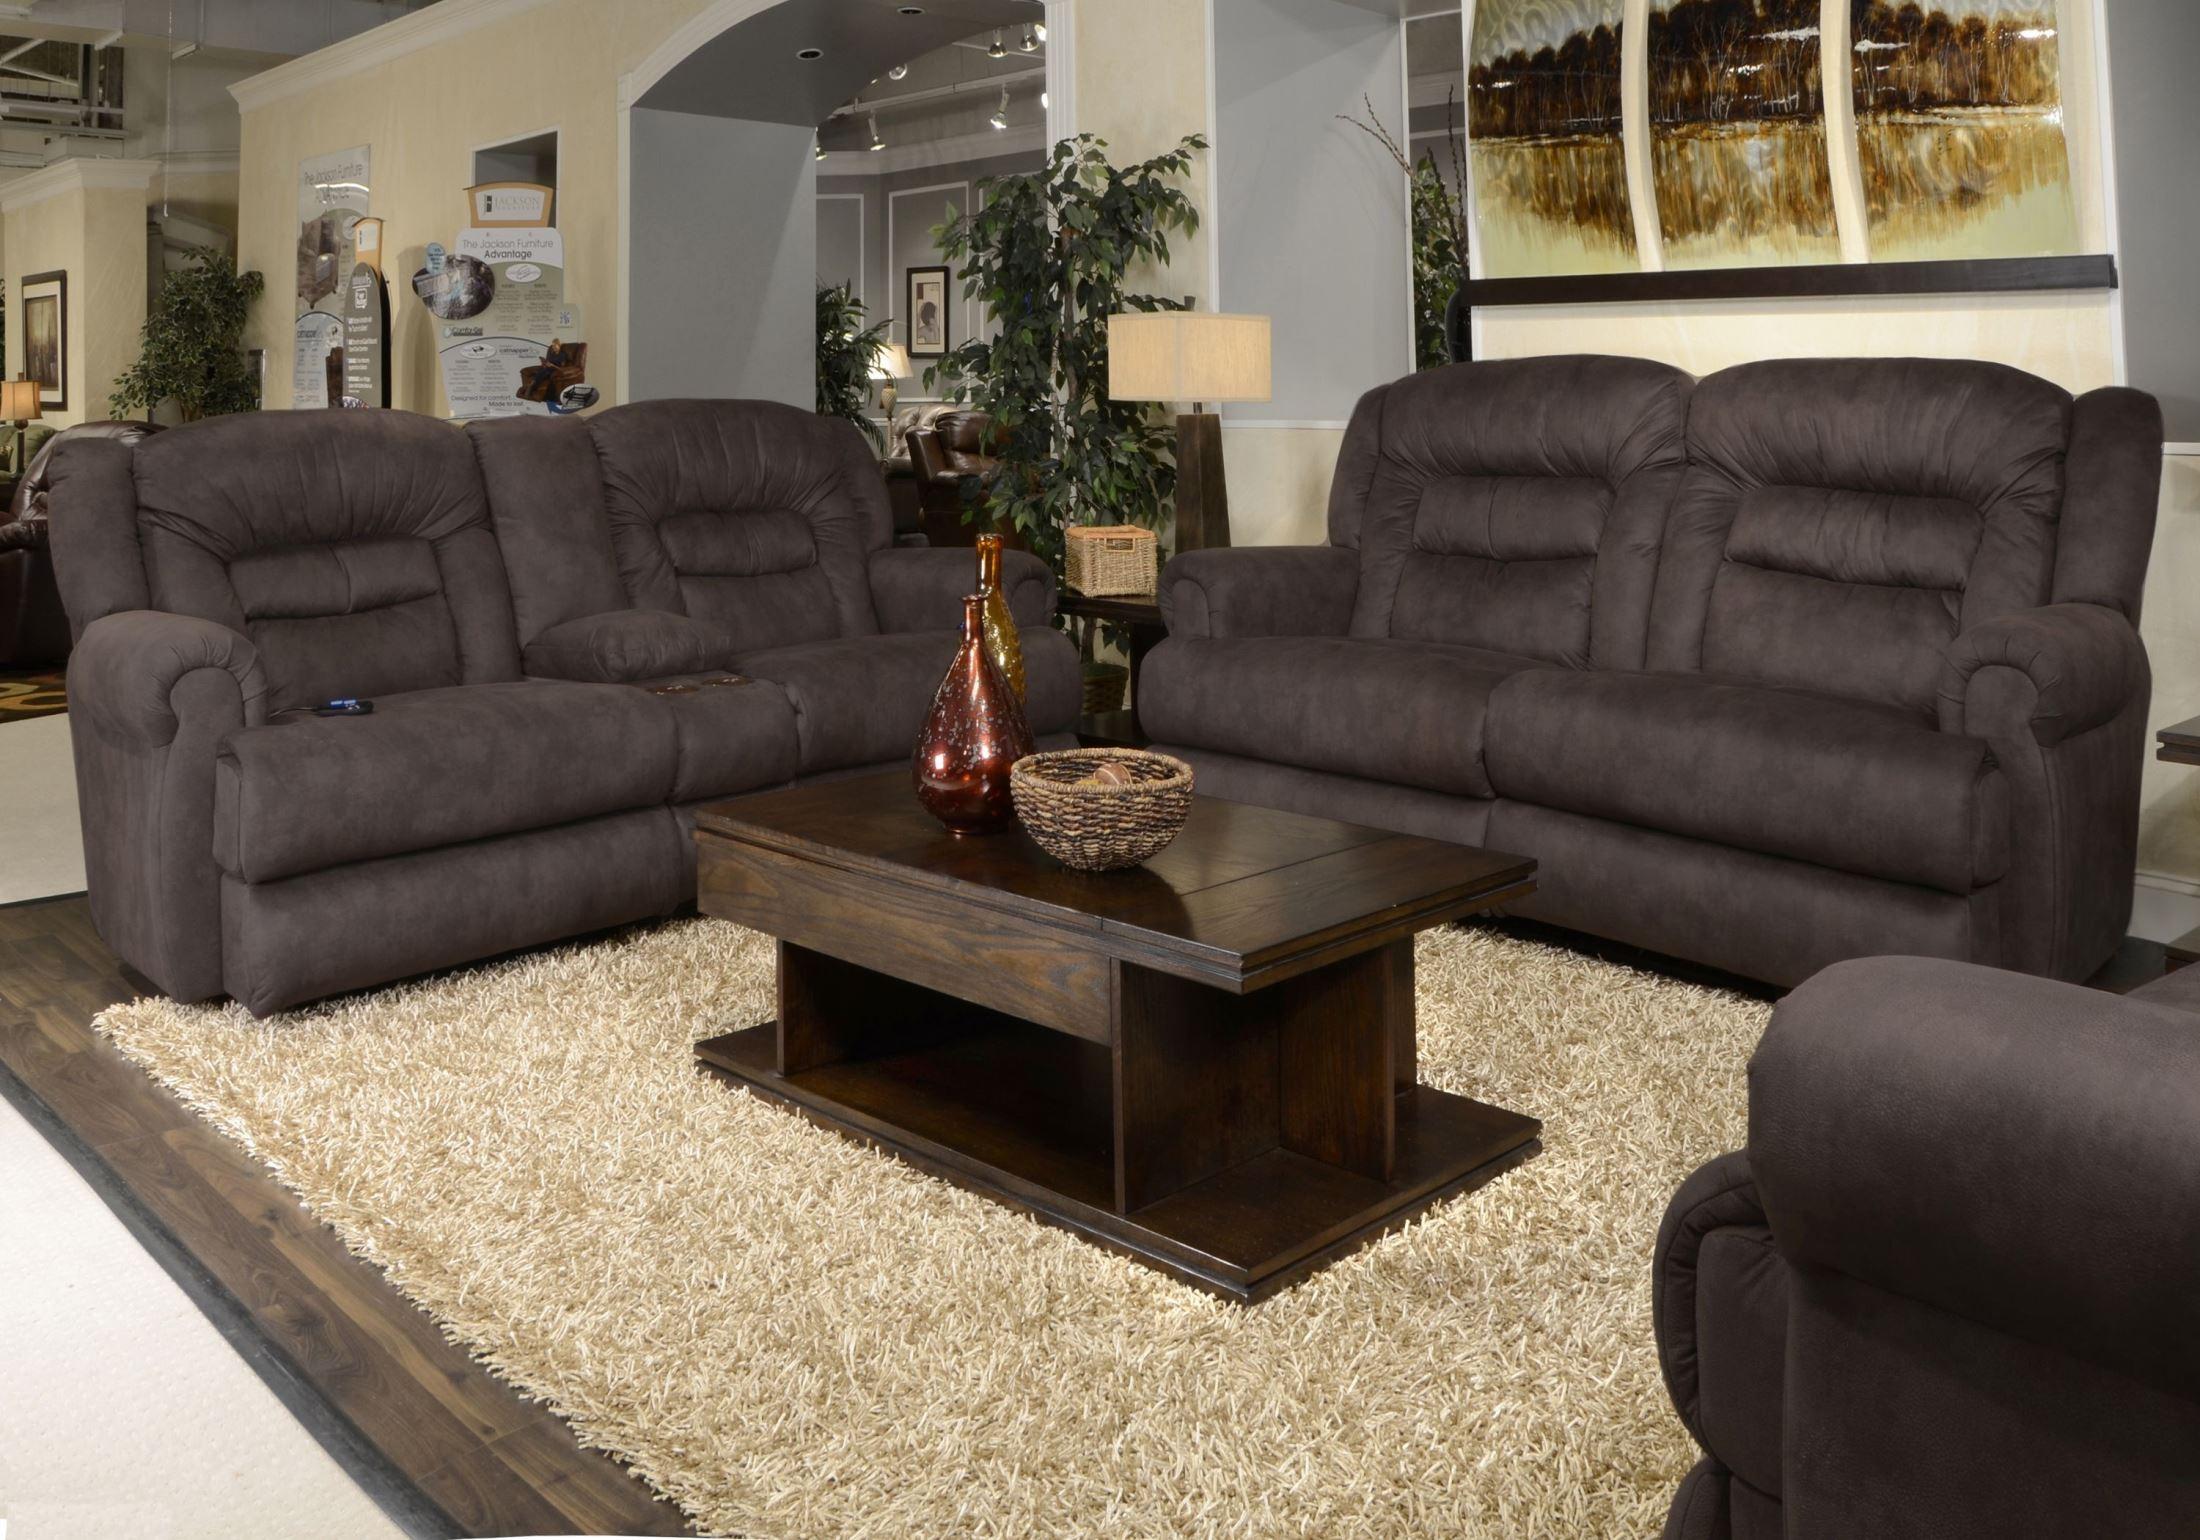 atlas sable extra tall power reclining living room set from catnapper 61561300000000000. Black Bedroom Furniture Sets. Home Design Ideas